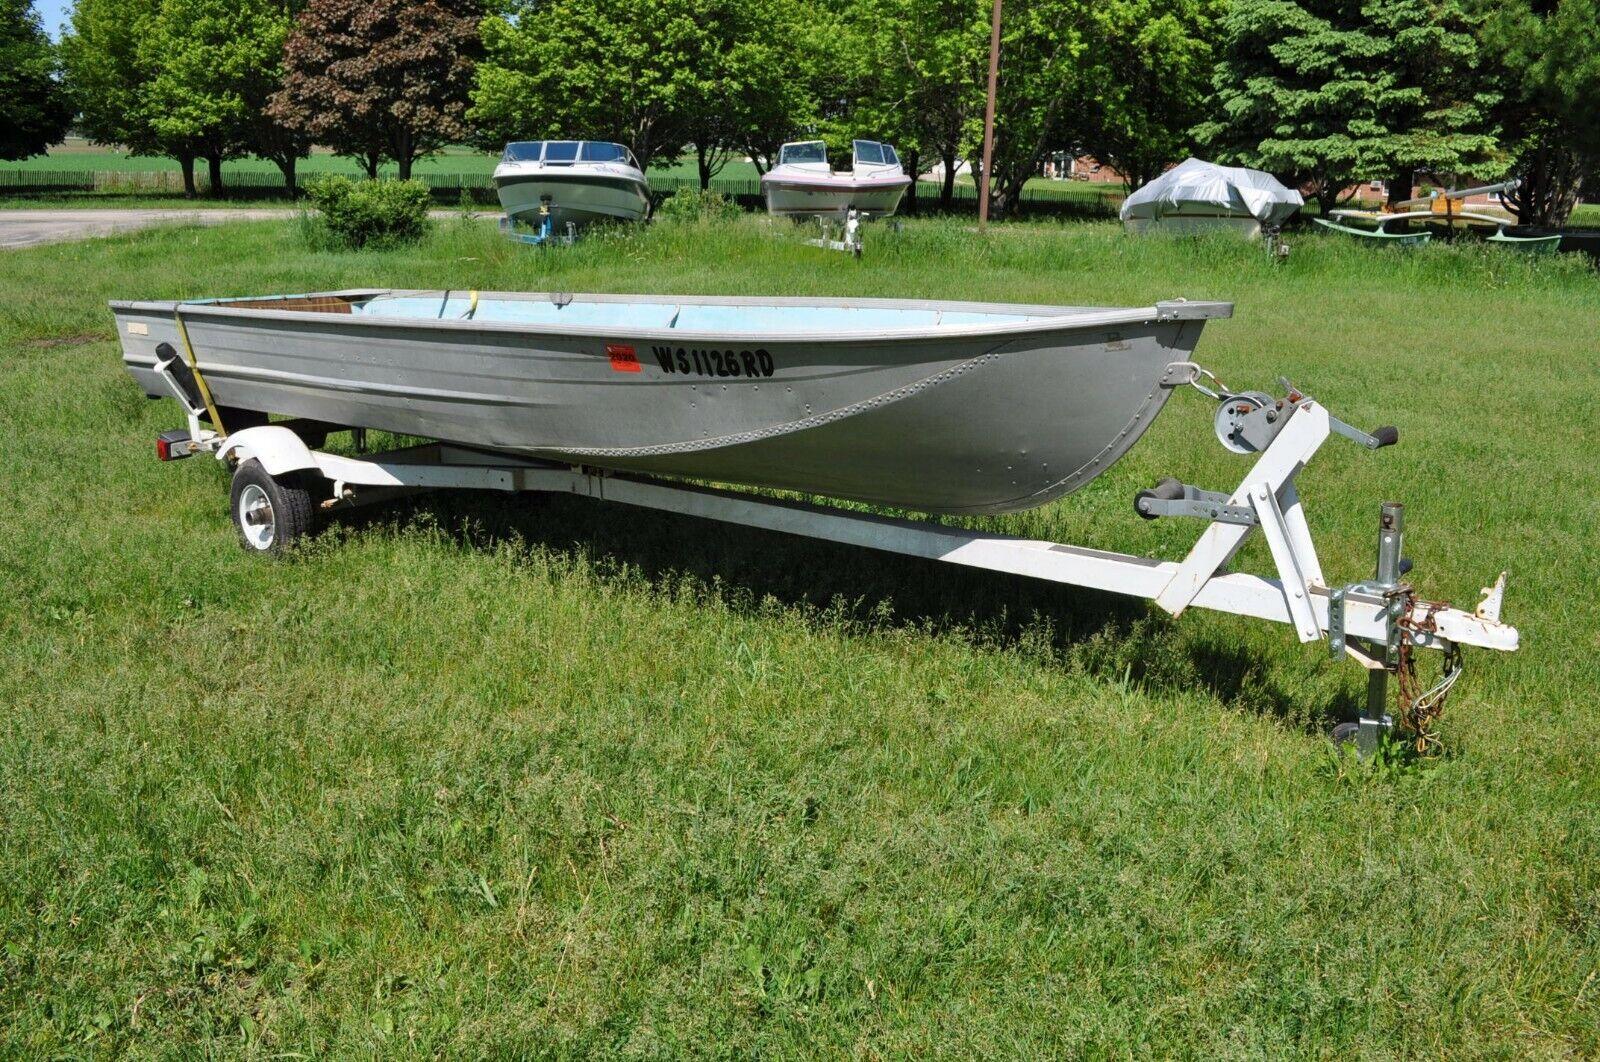 1975 Montgomery Ward Sea King aluminum boat 14' with trailer fishing